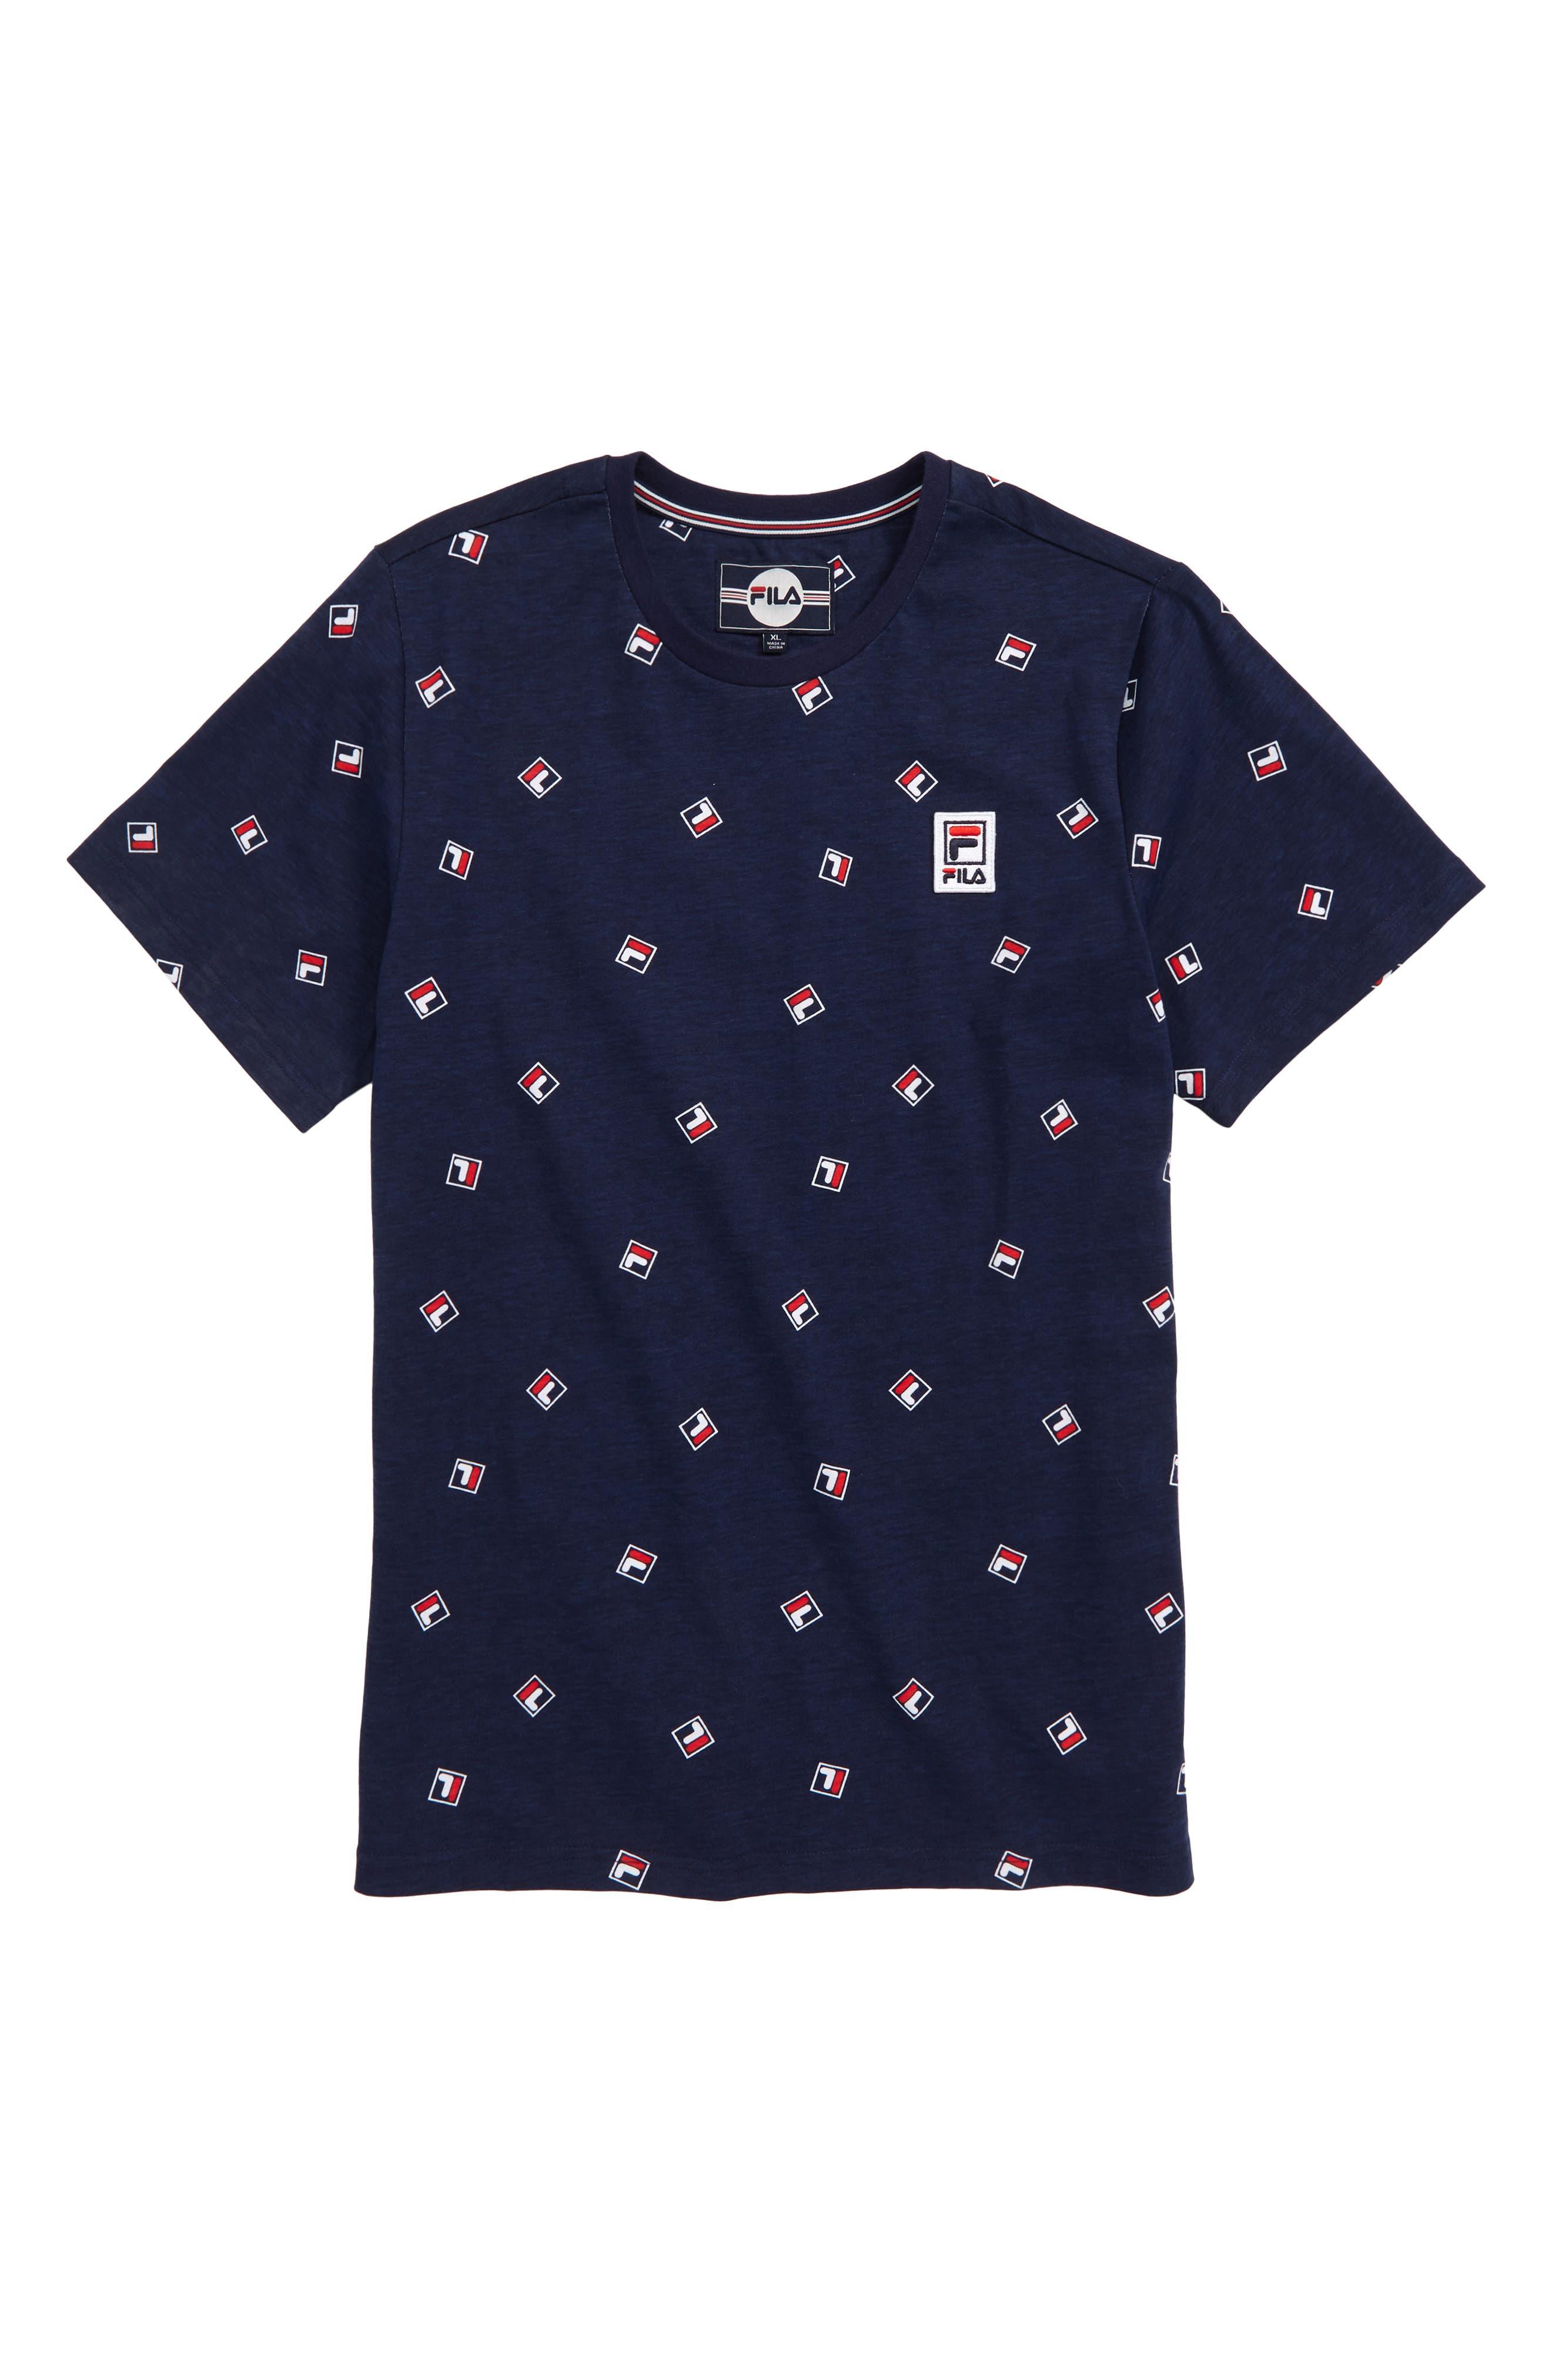 FILA, Logo Print T-Shirt, Main thumbnail 1, color, NAVY